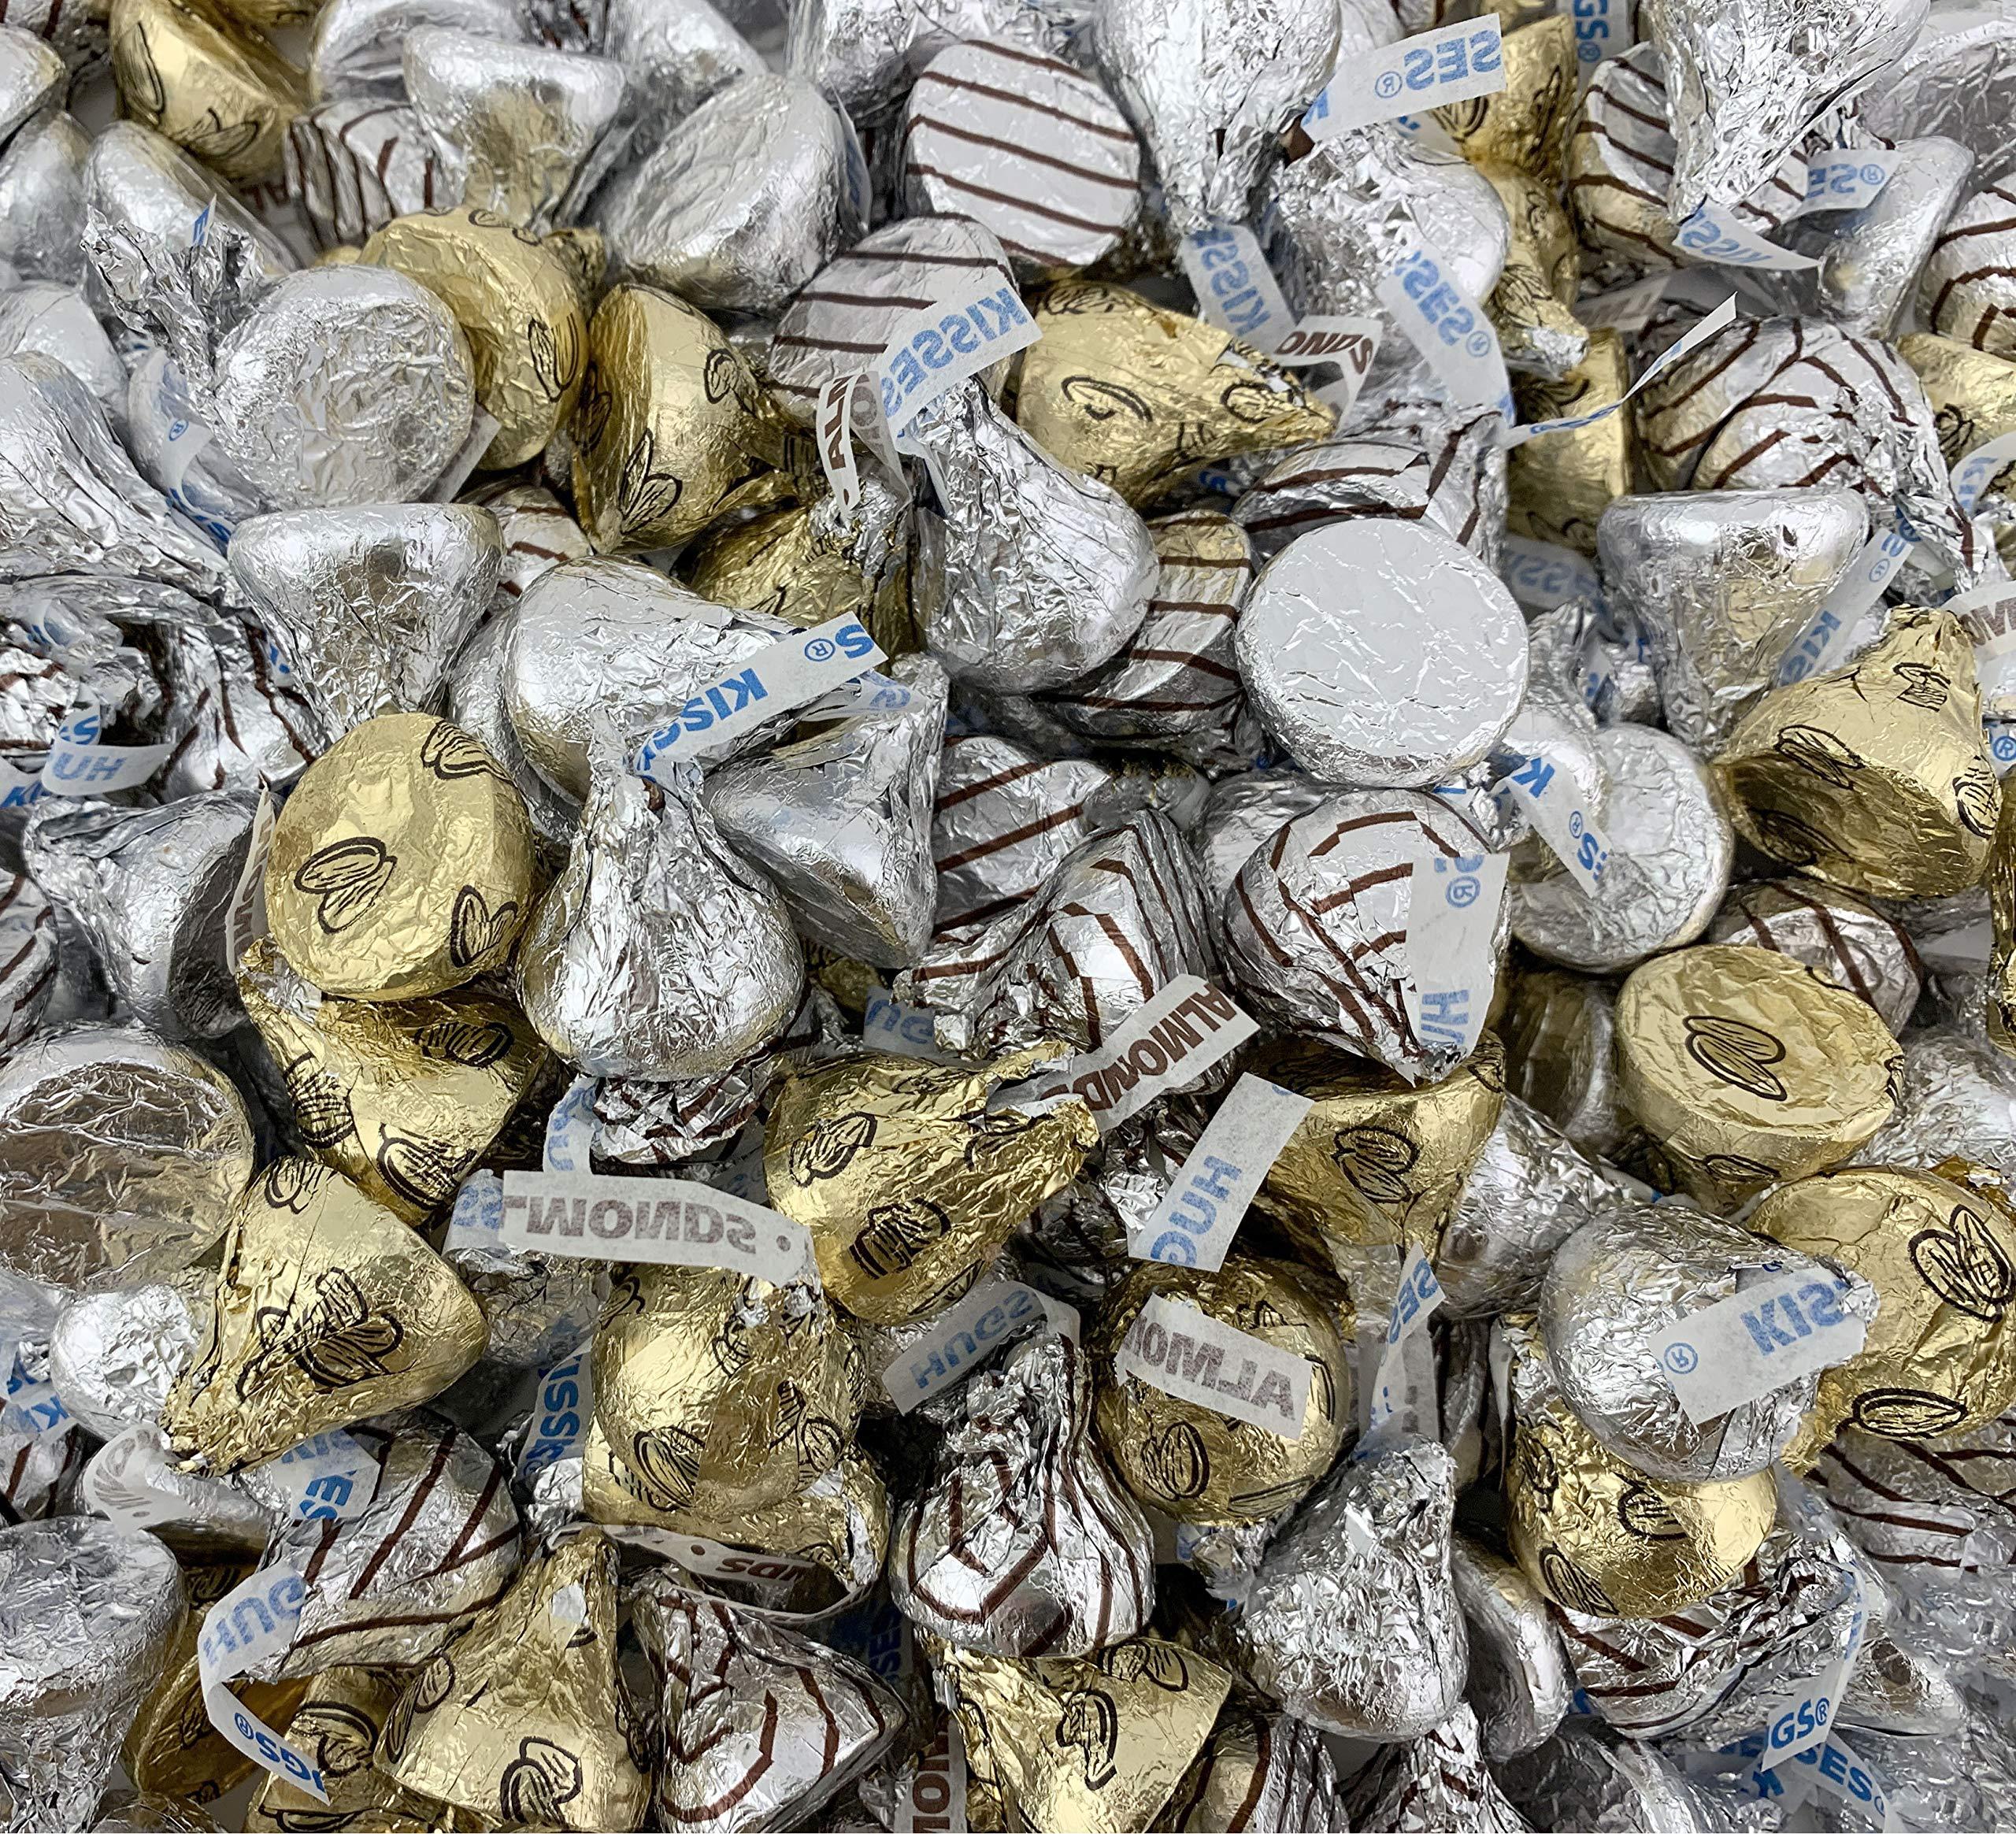 Spring HERSHEY'S KISSES Candy Assortment HERSHEY'S KISSES Milk Chocolate, KISSES HUGS White Creme, KISSES Almonds, Gold Silver Foil, Bulk 4 Pounds